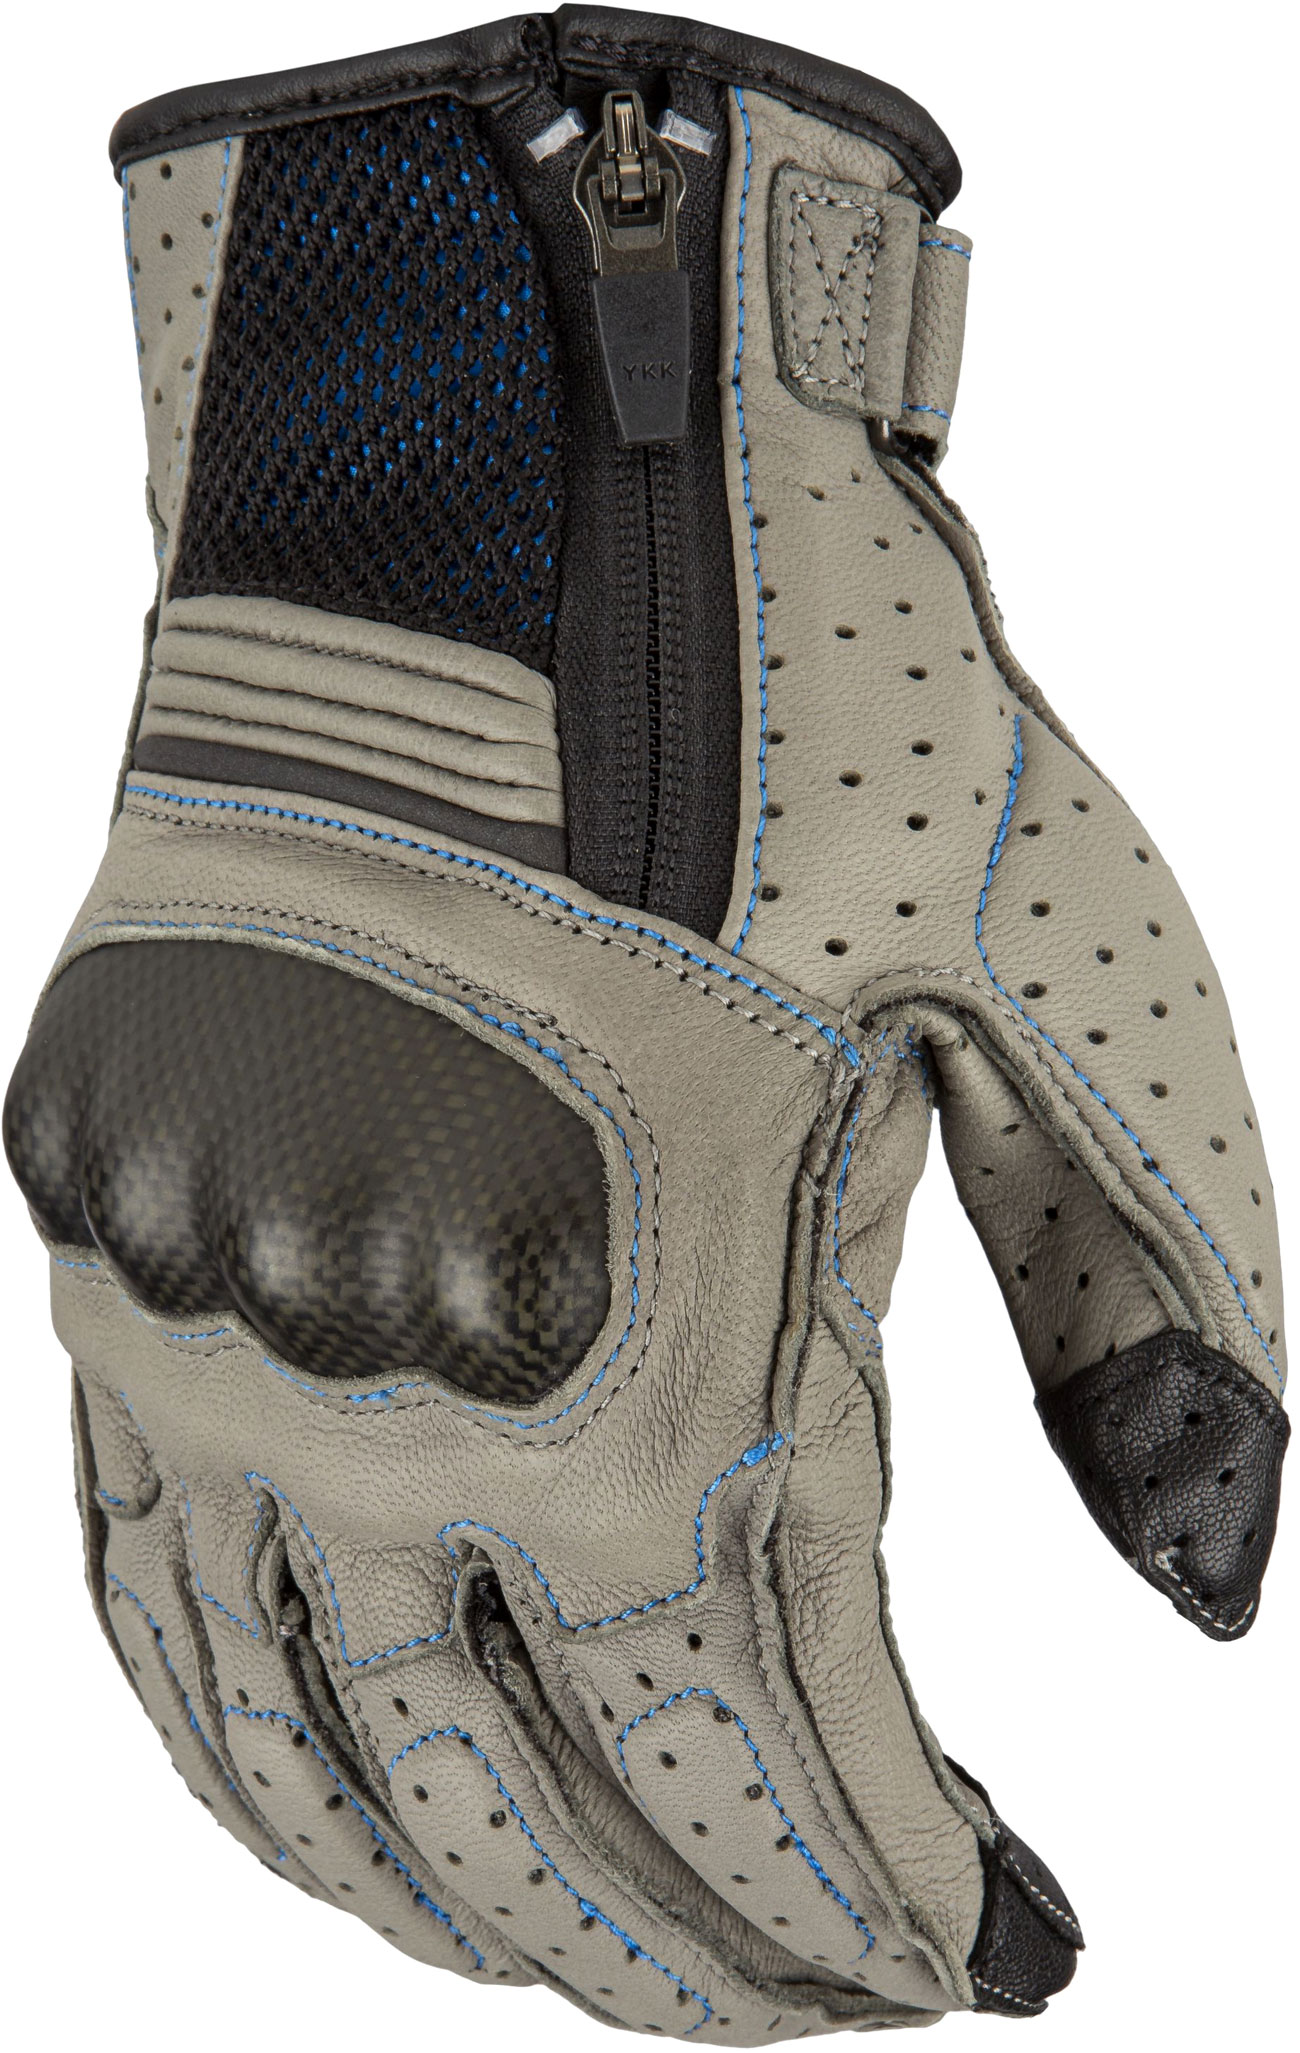 Klim Induction S20, Handschuhe - Grau/Blau - S 5028-001-120-601